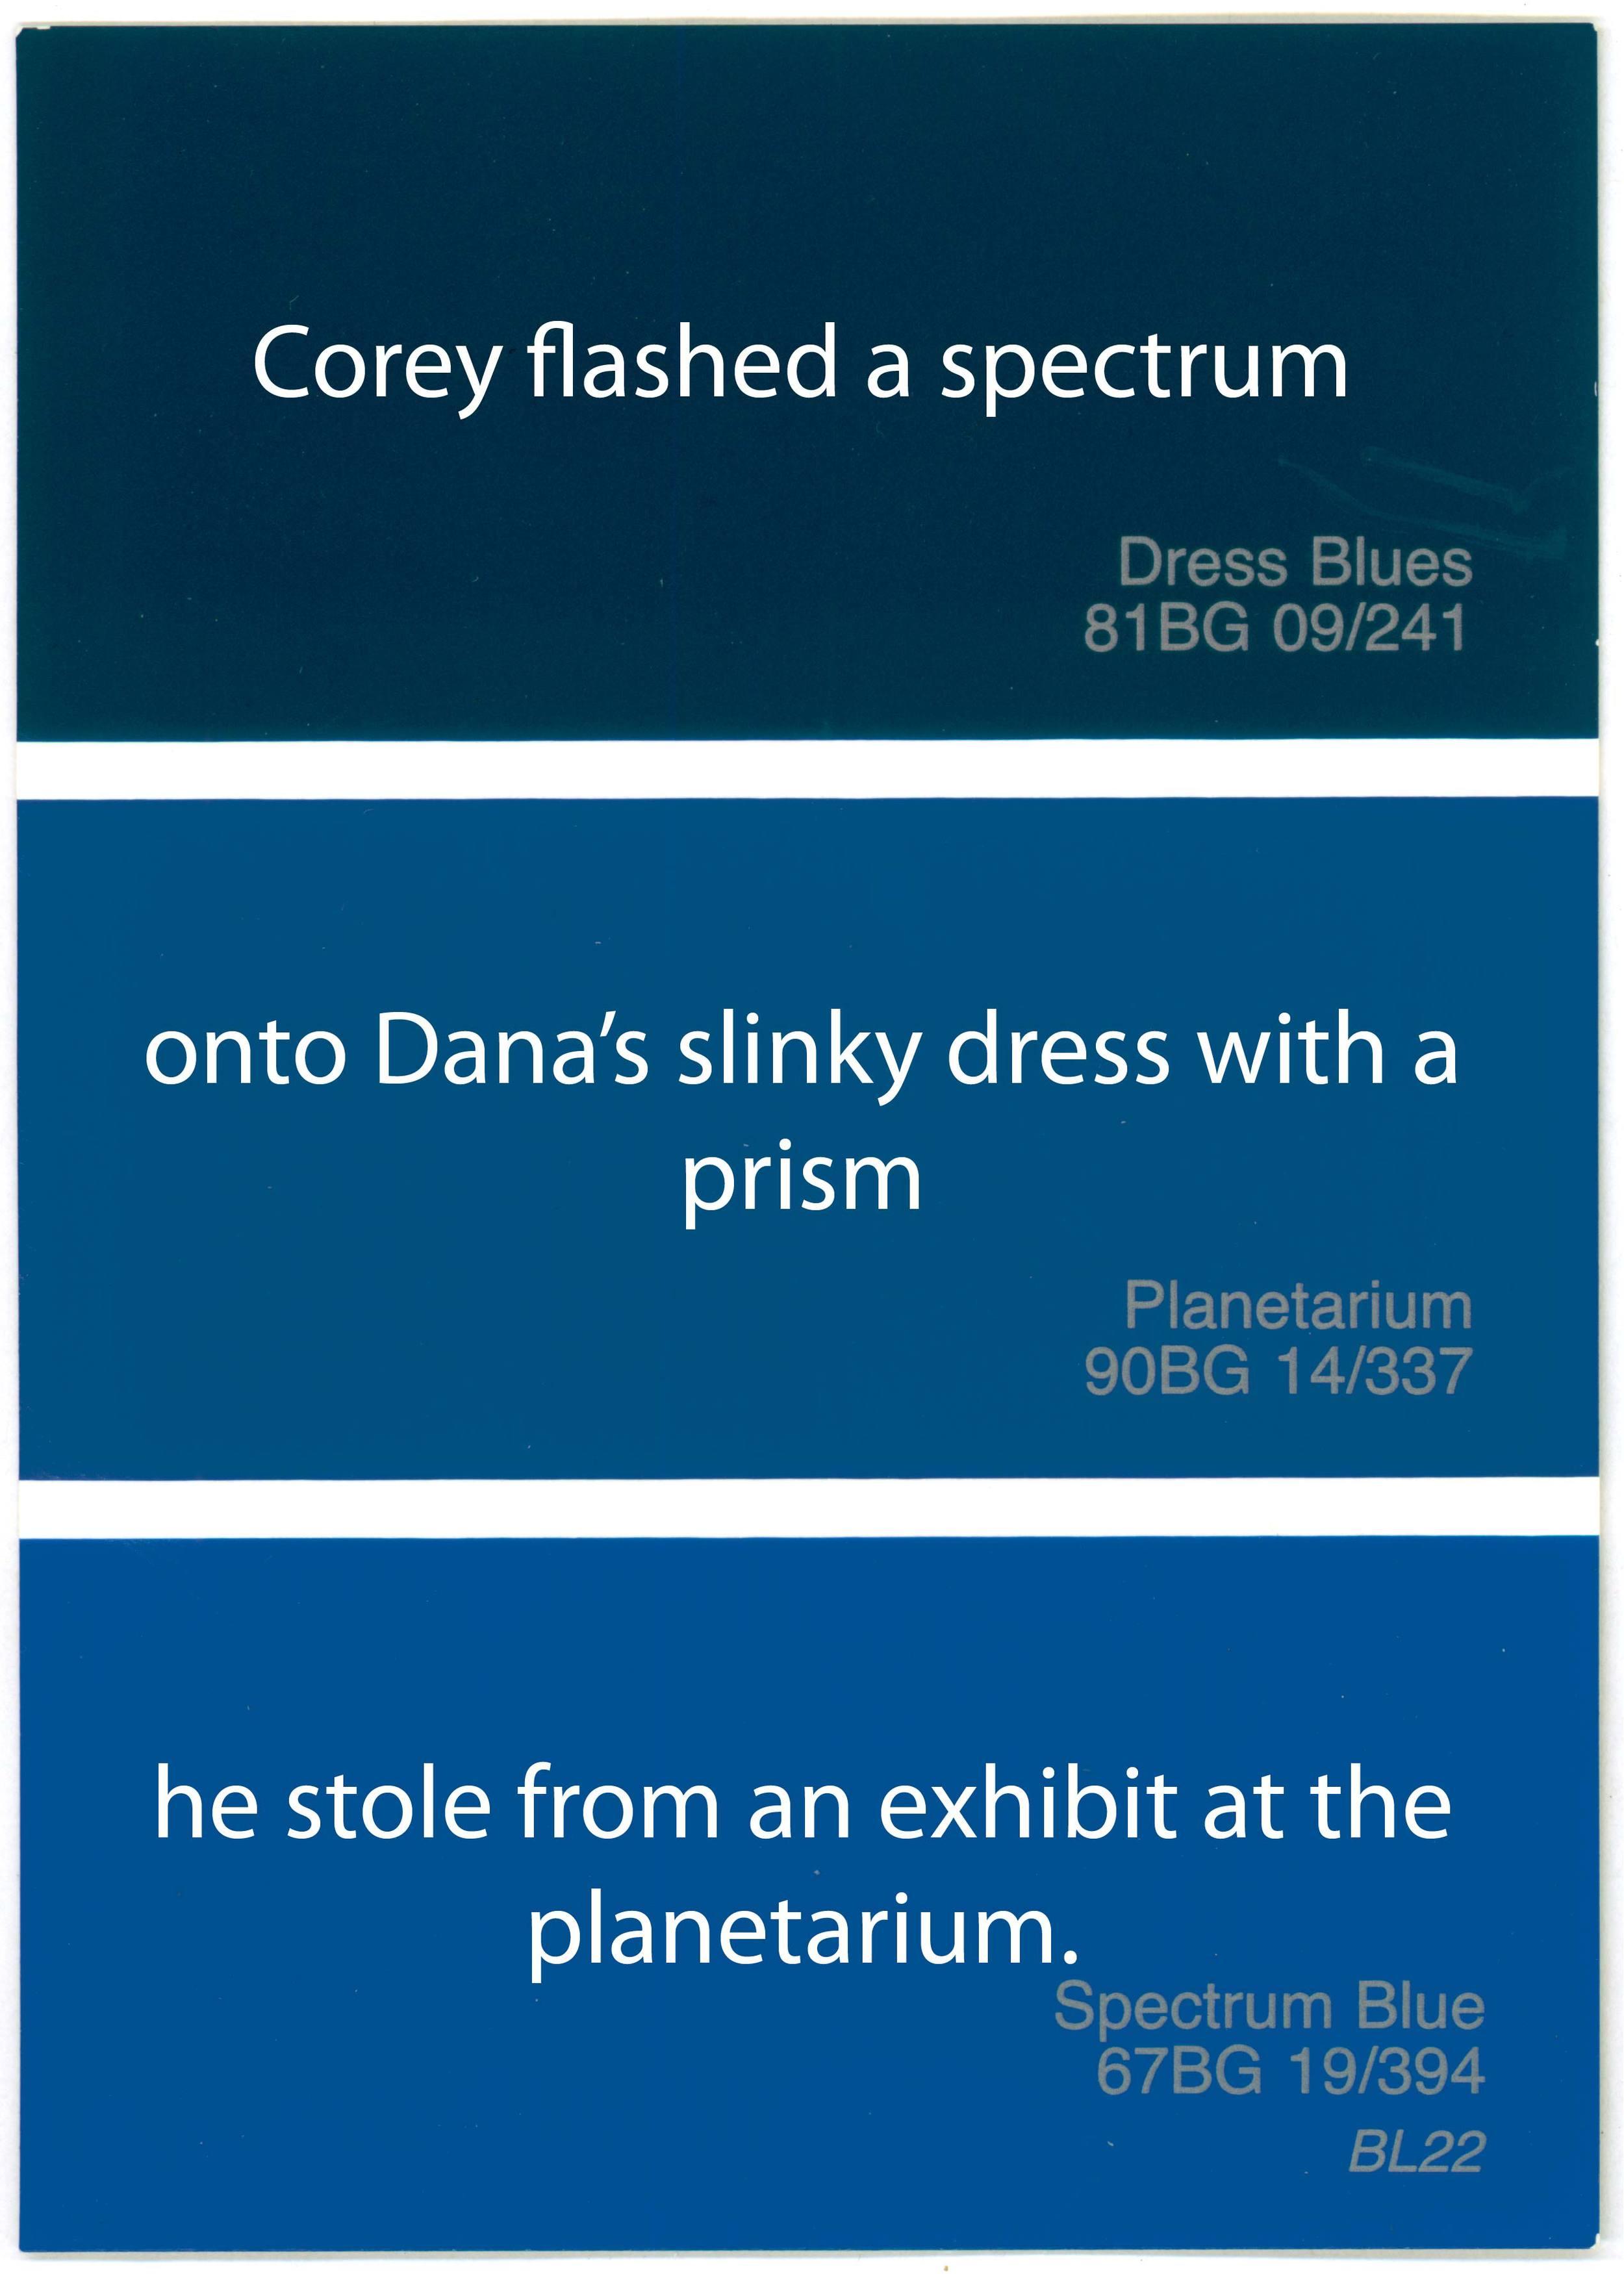 Dress Blue, Planetarium, Spectrum Blue